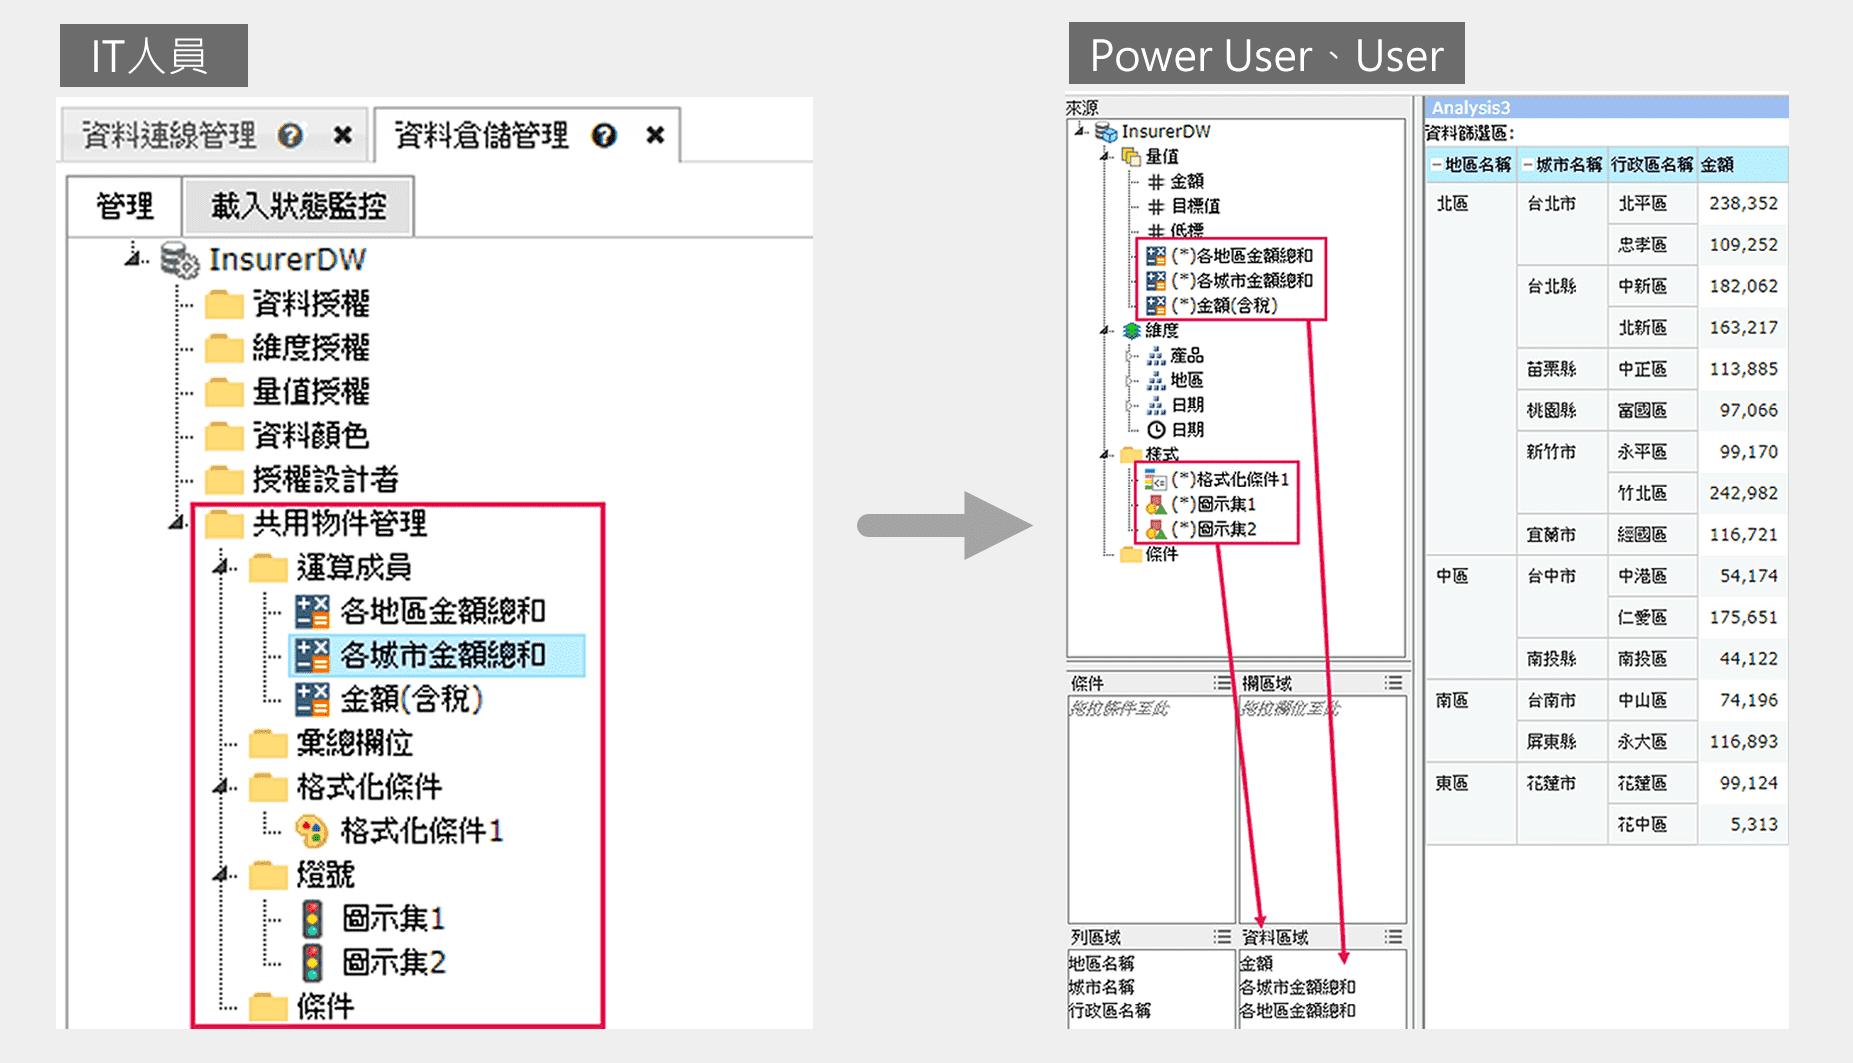 IT準備共用物件(左),Power User、User直接拖拉使用(右)